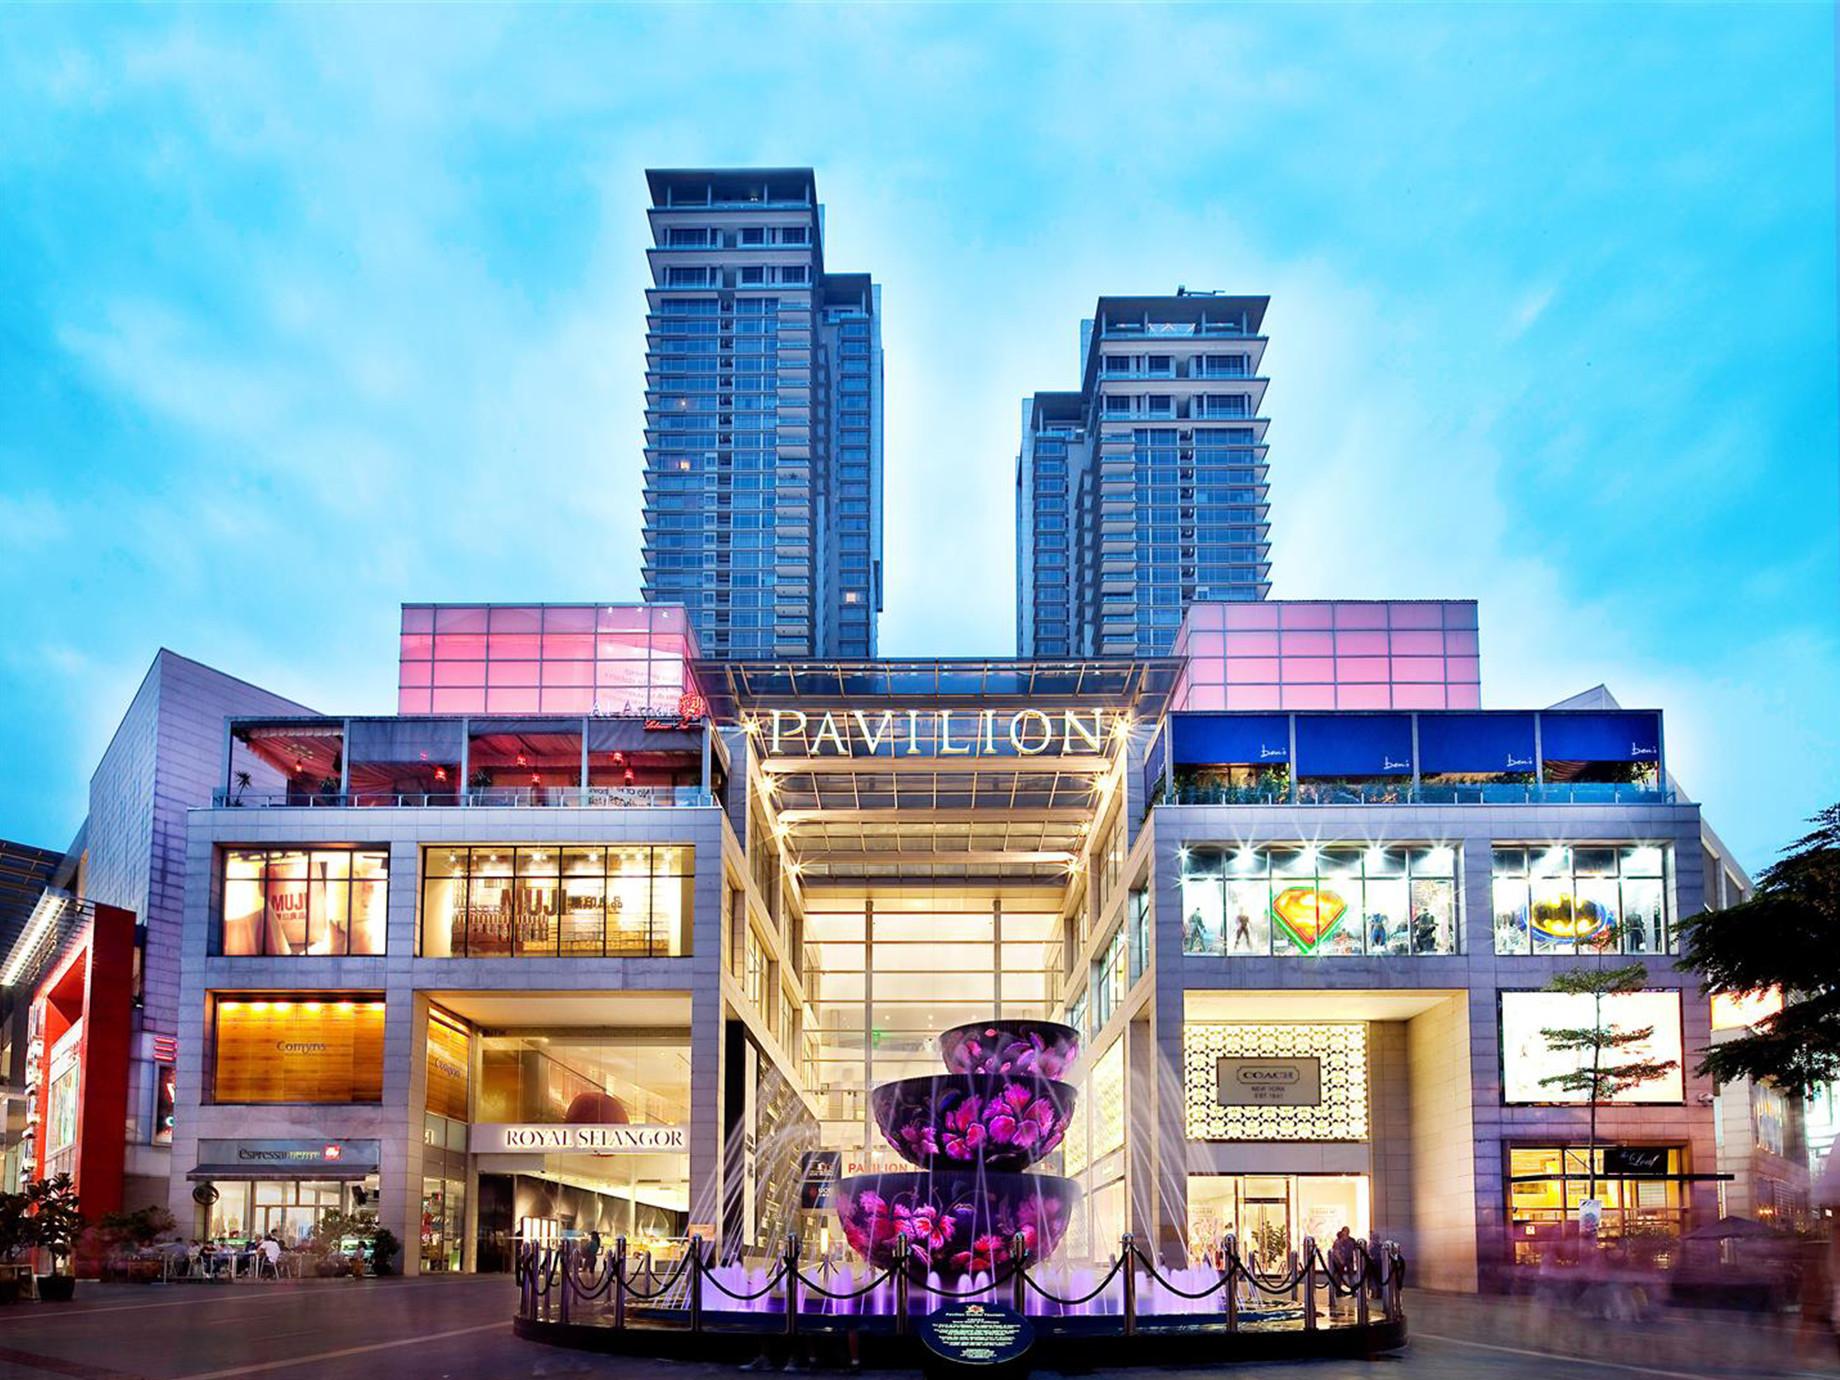 momo購物與Pavilion集團合作,正式進軍馬來西亞